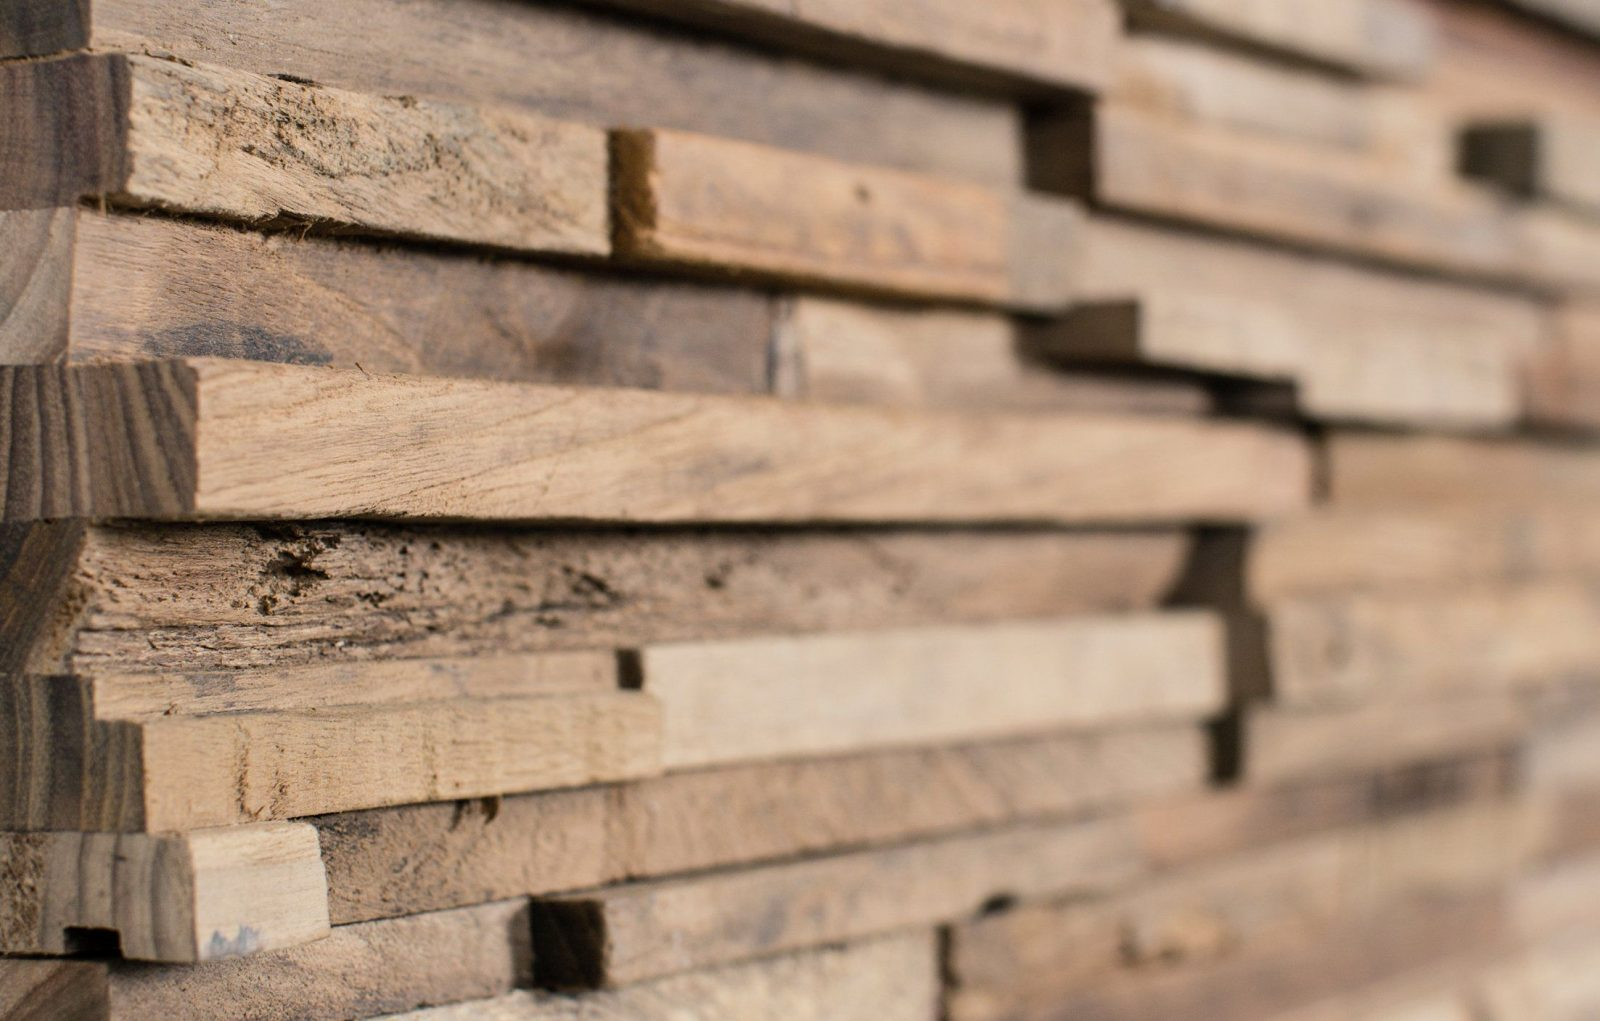 Wandverkleidung Holz Selber Machen New Glasborde Einhaengen von Wandverkleidung Holz Selber Bauen Photo